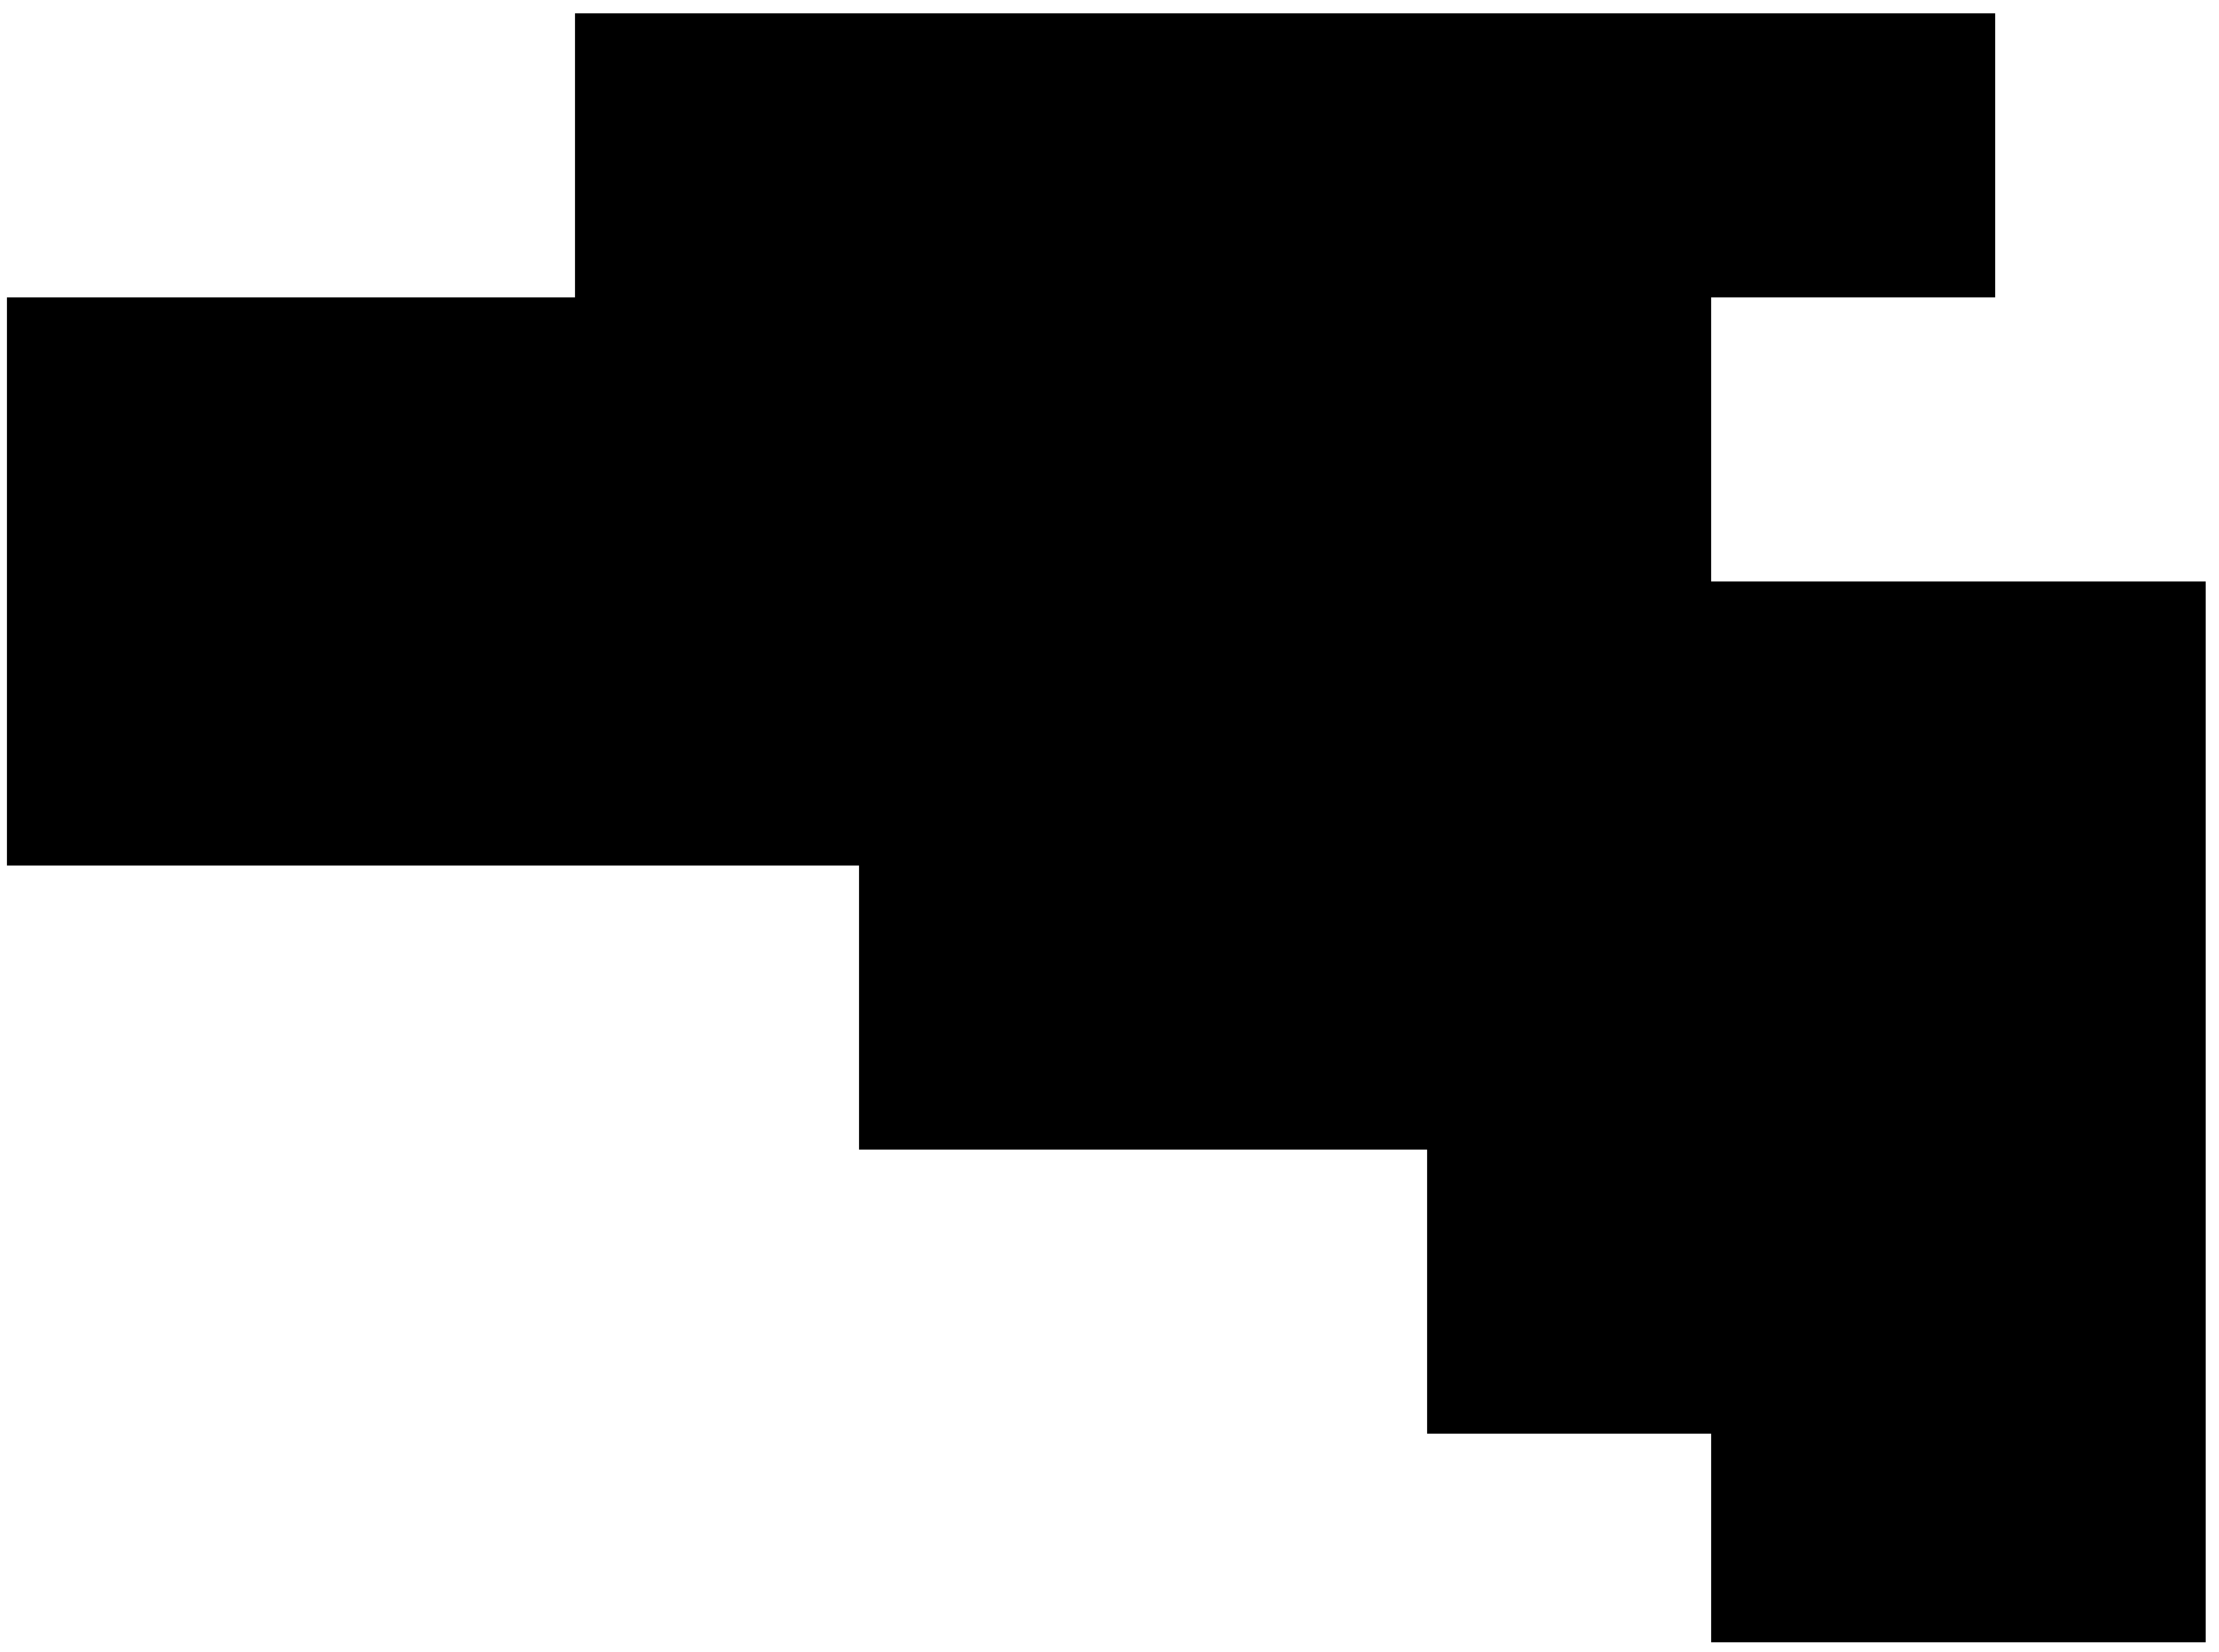 Surfer Silhouette PNG Clip Art Image.